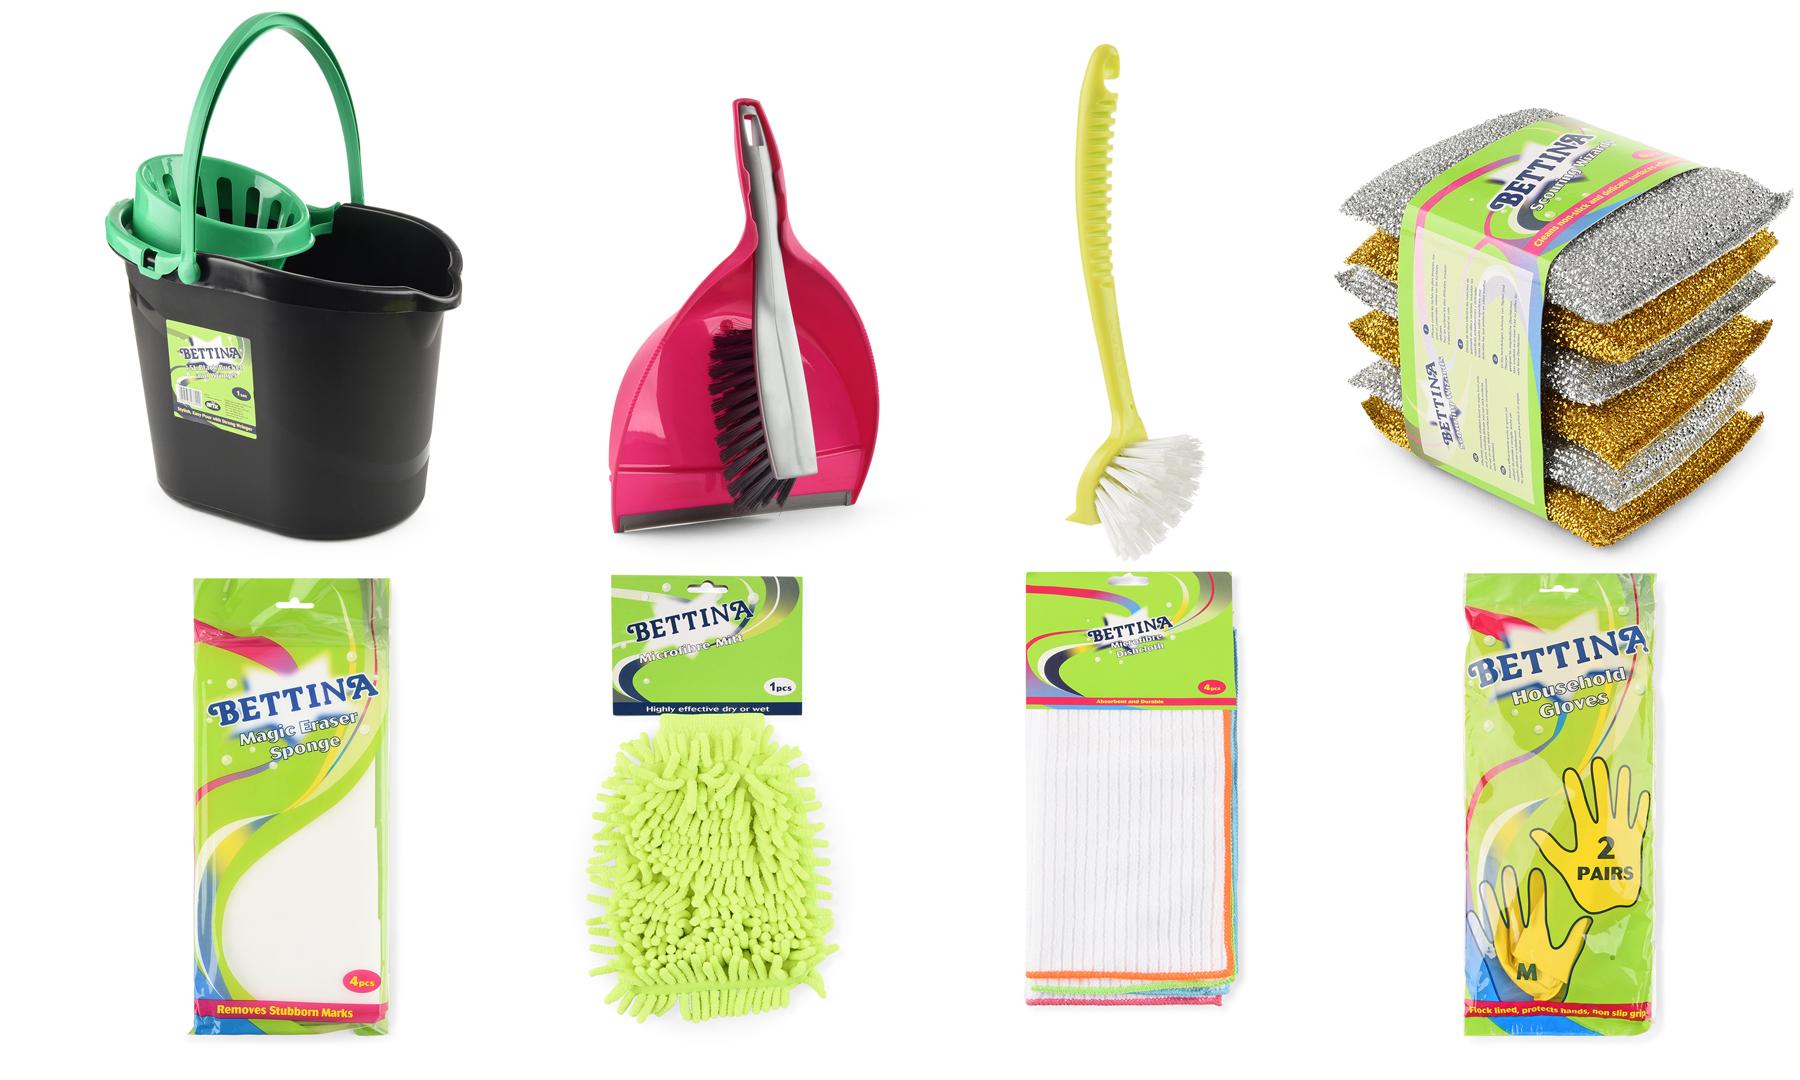 Set de curatenie bettina household cleaning set - Limpieza de casas groupon ...